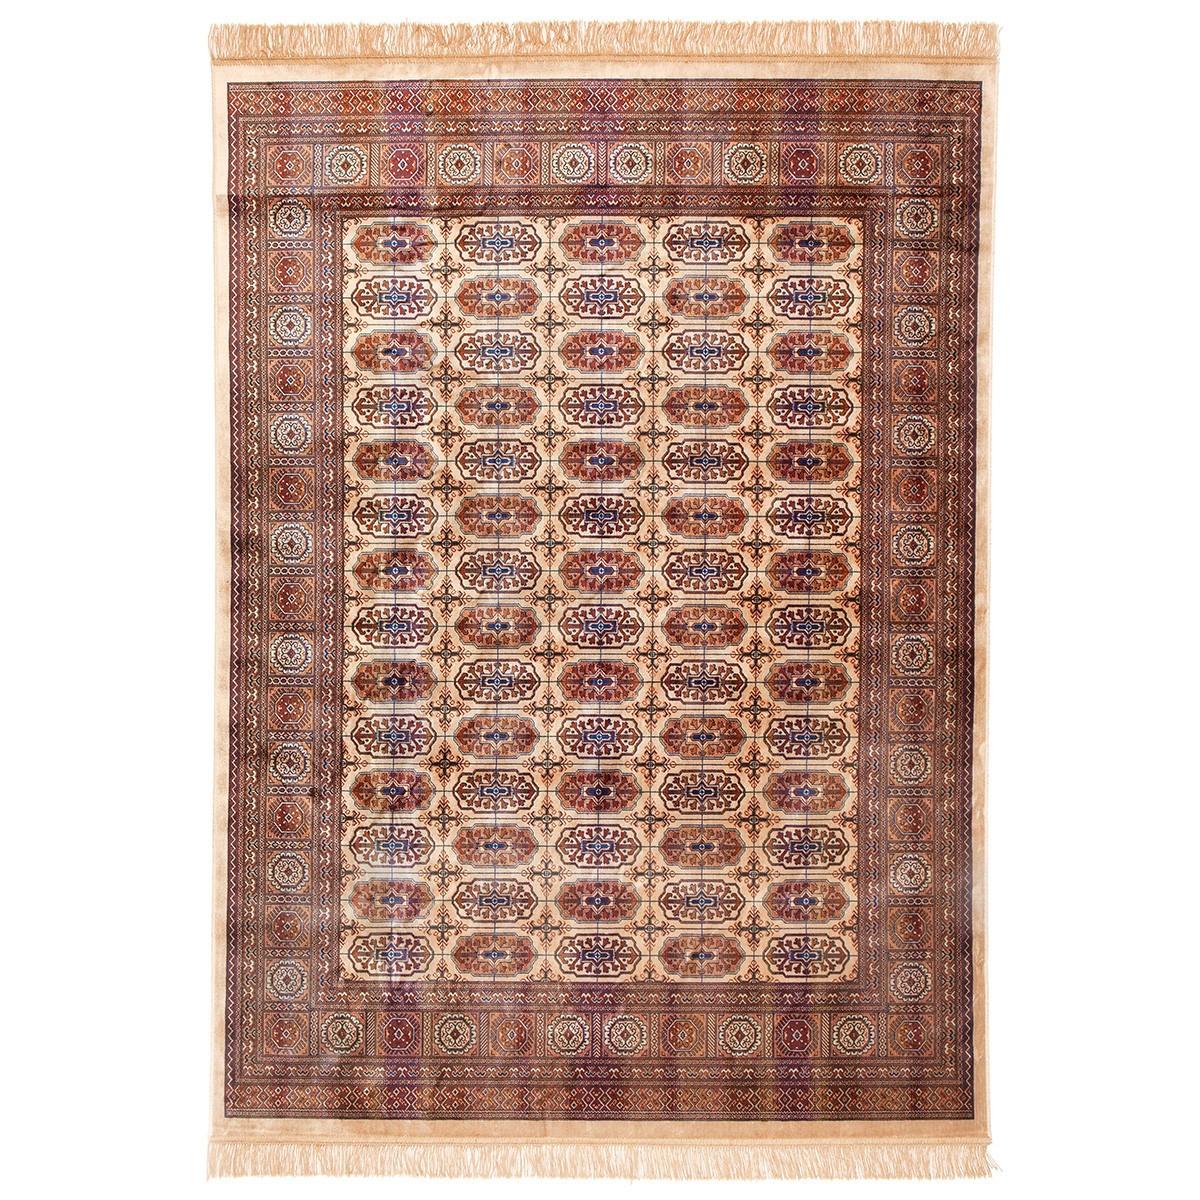 Chiraz Adani Traditional Oriental Rug, 200x137cm, Beige